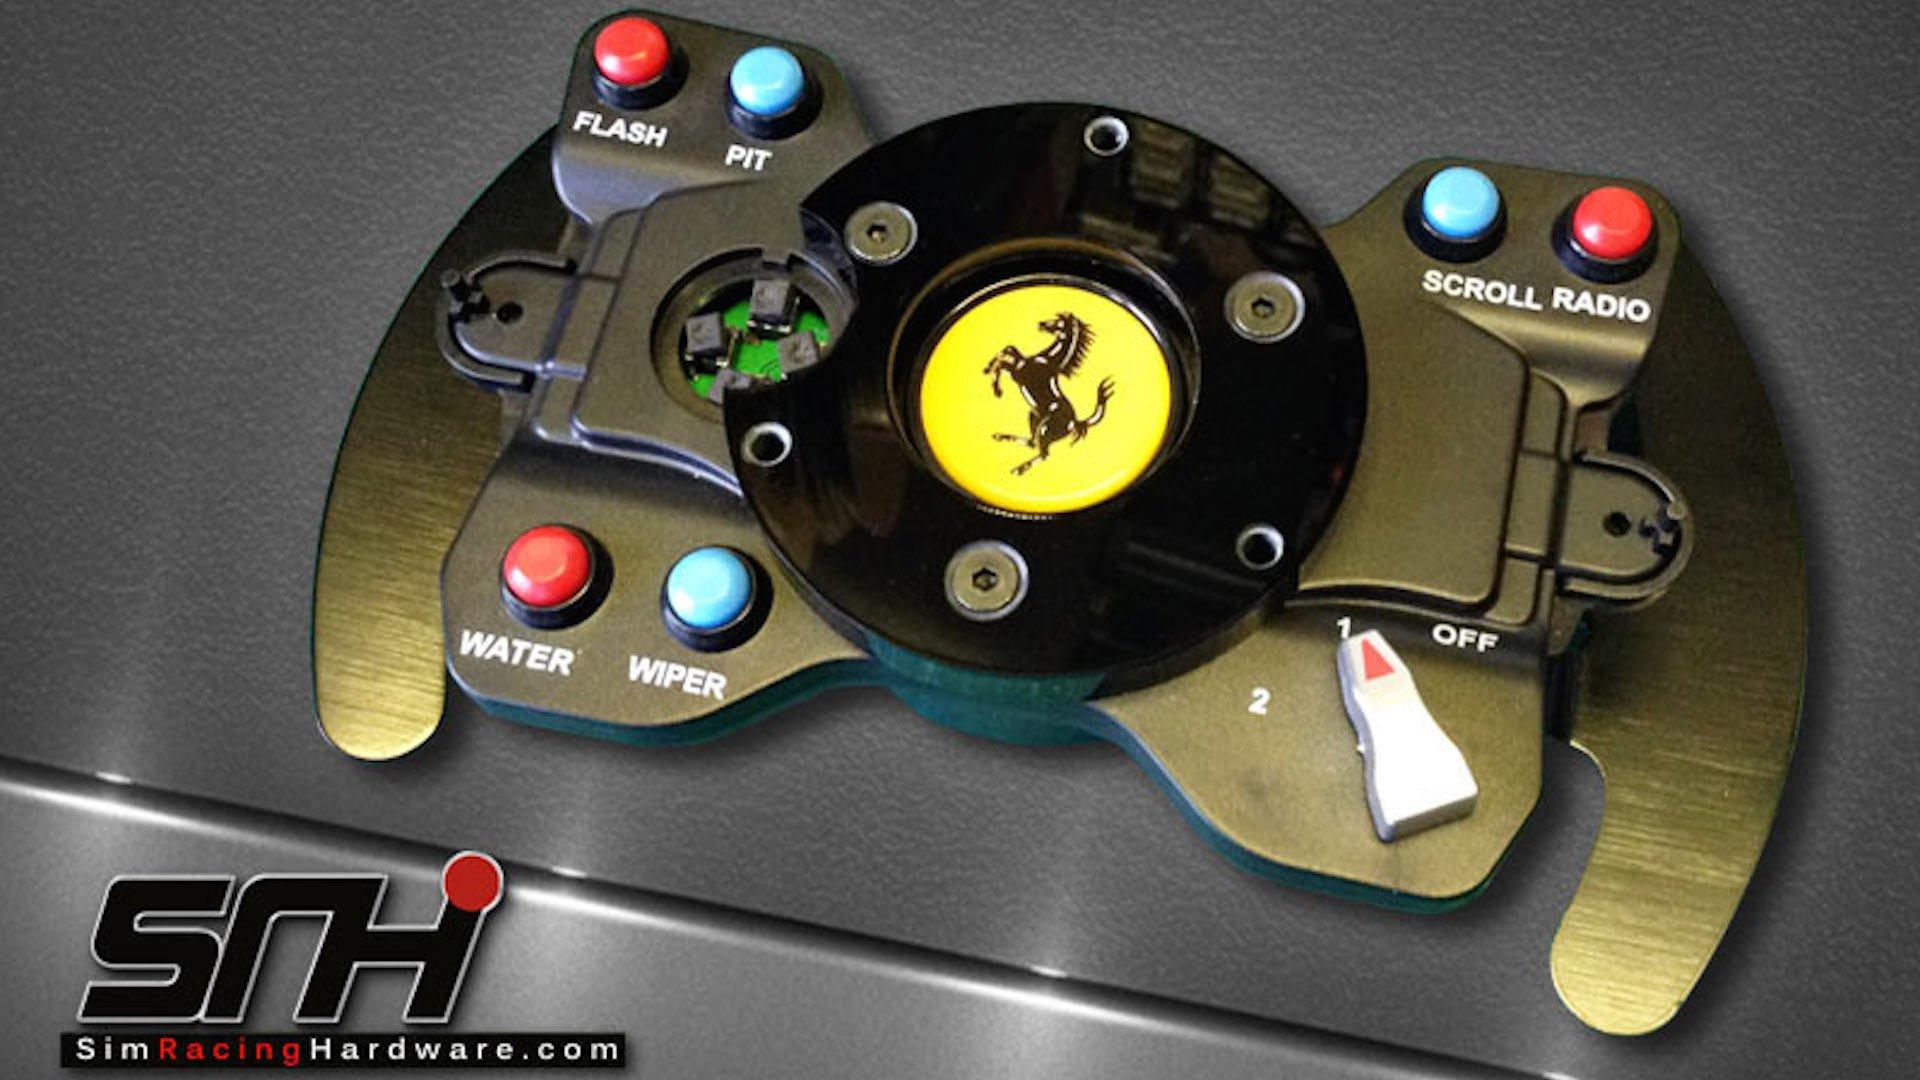 New Thrustmaster GTE Wheel Adaptor from SRH